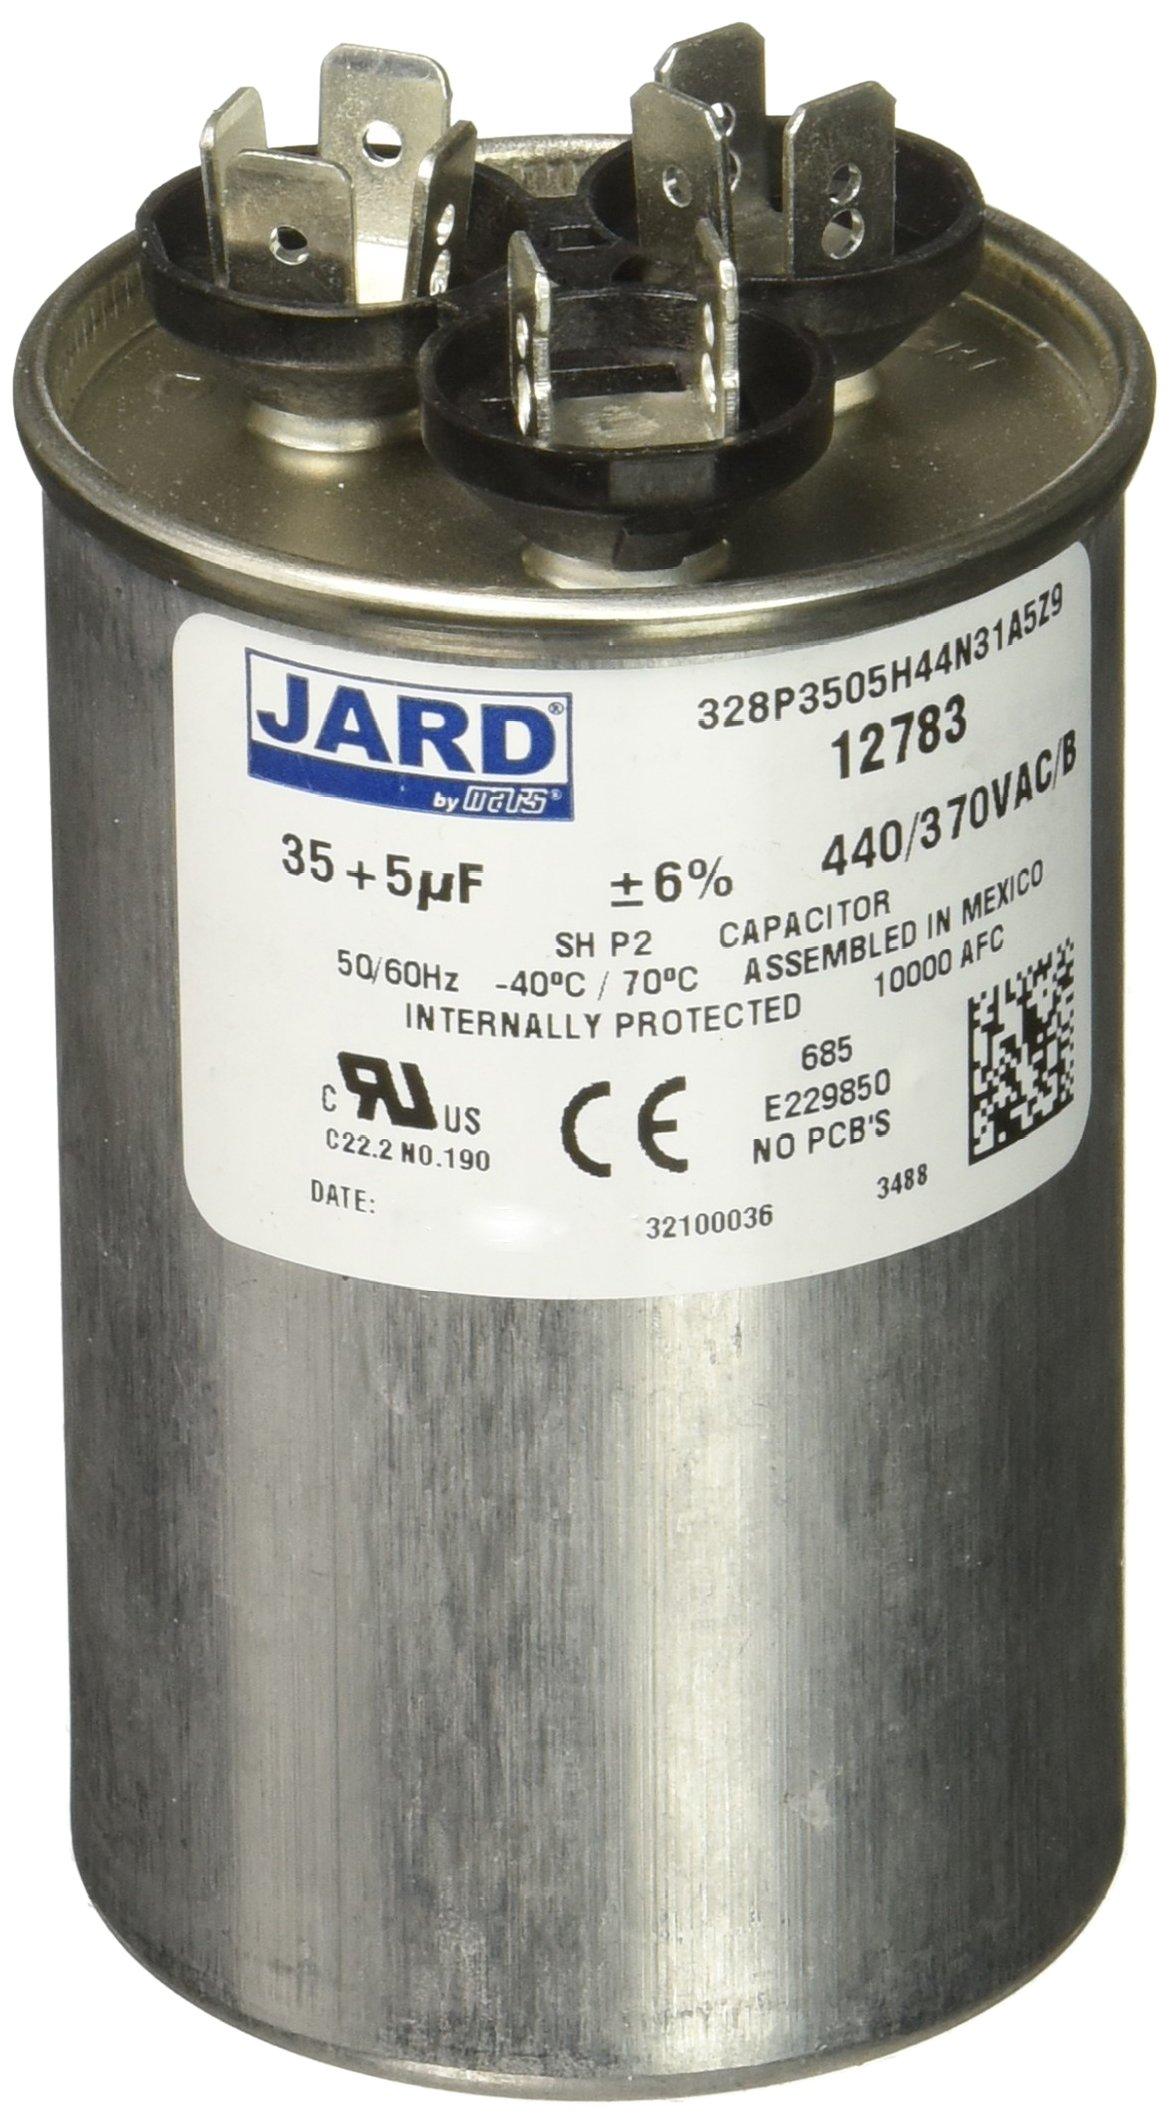 USA Dual Run Round 35//5 uf MFD 370 Volt 440 VAC Replaces Genteq Z97F9848 97F9848